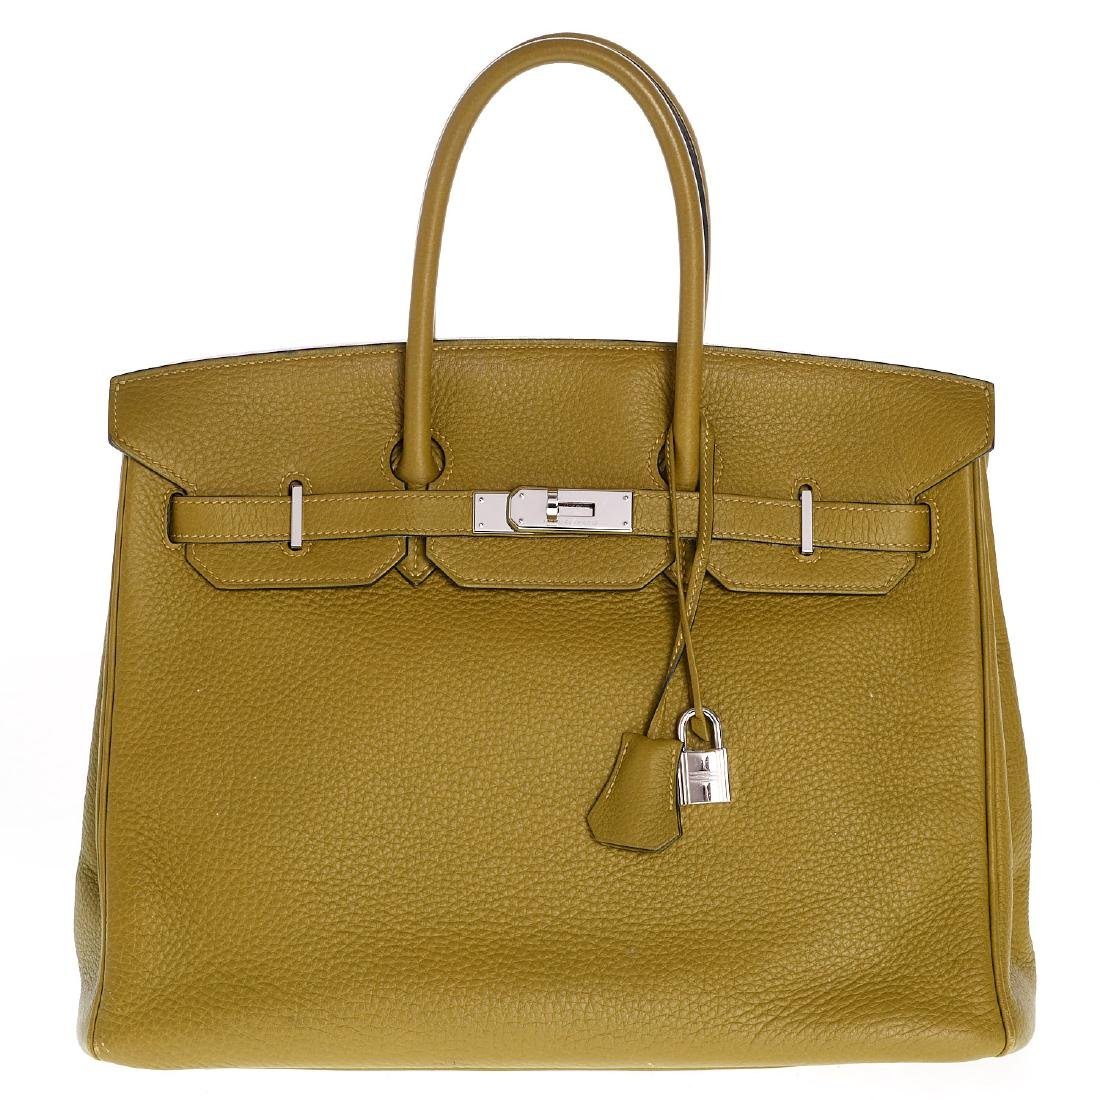 Hermes Birkin 35 Sauge Clemence handbag